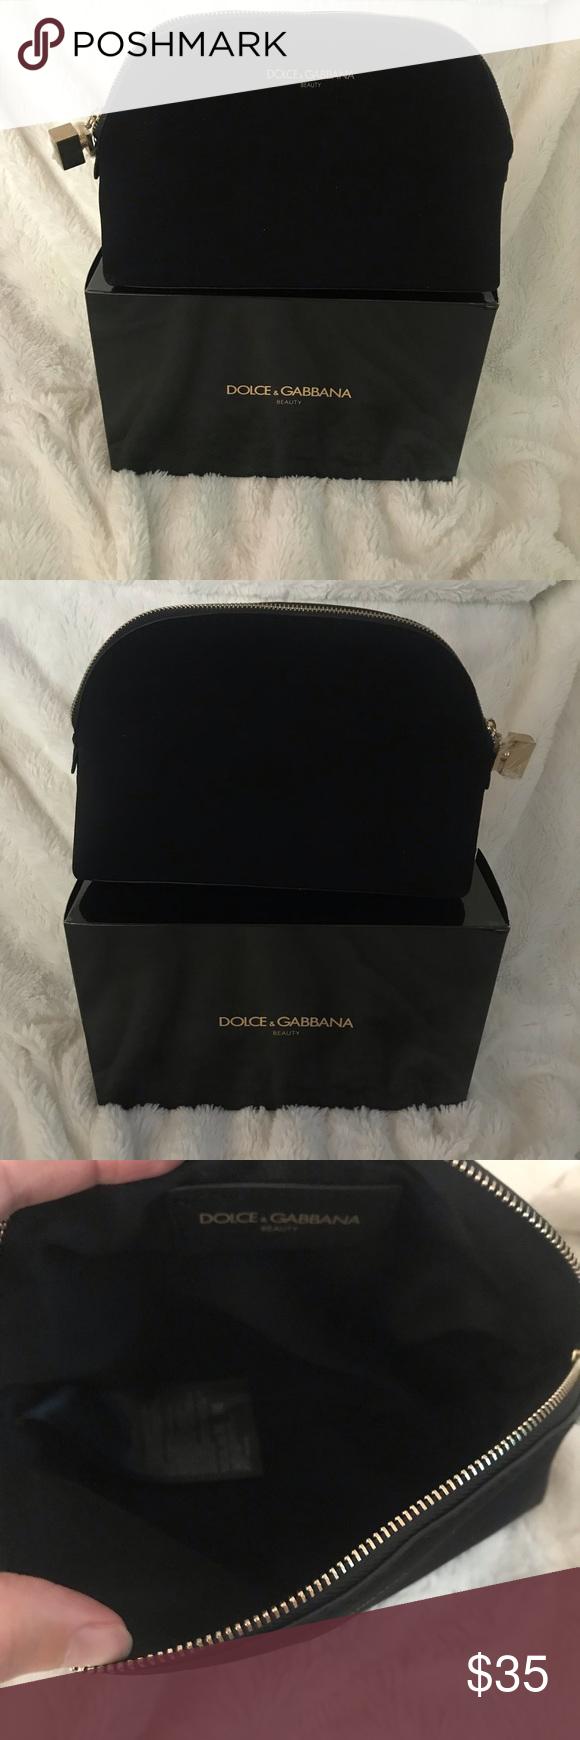 Dolce & Gabbana Black Velvet Makeup Bag Cosmetic Dolce